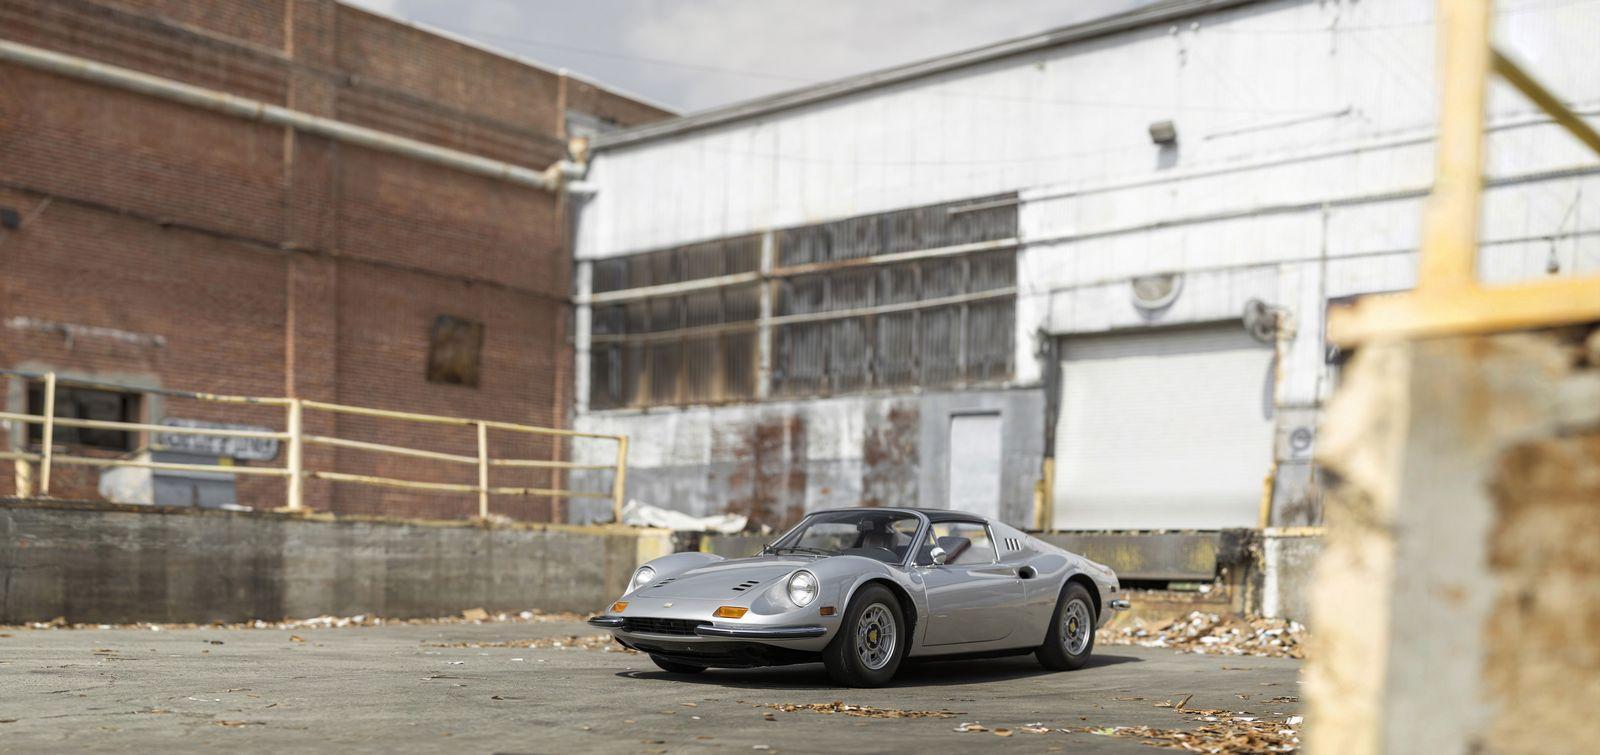 1974 Ferrari Dino 246 Gts Crossing Auction Block Gtspirit